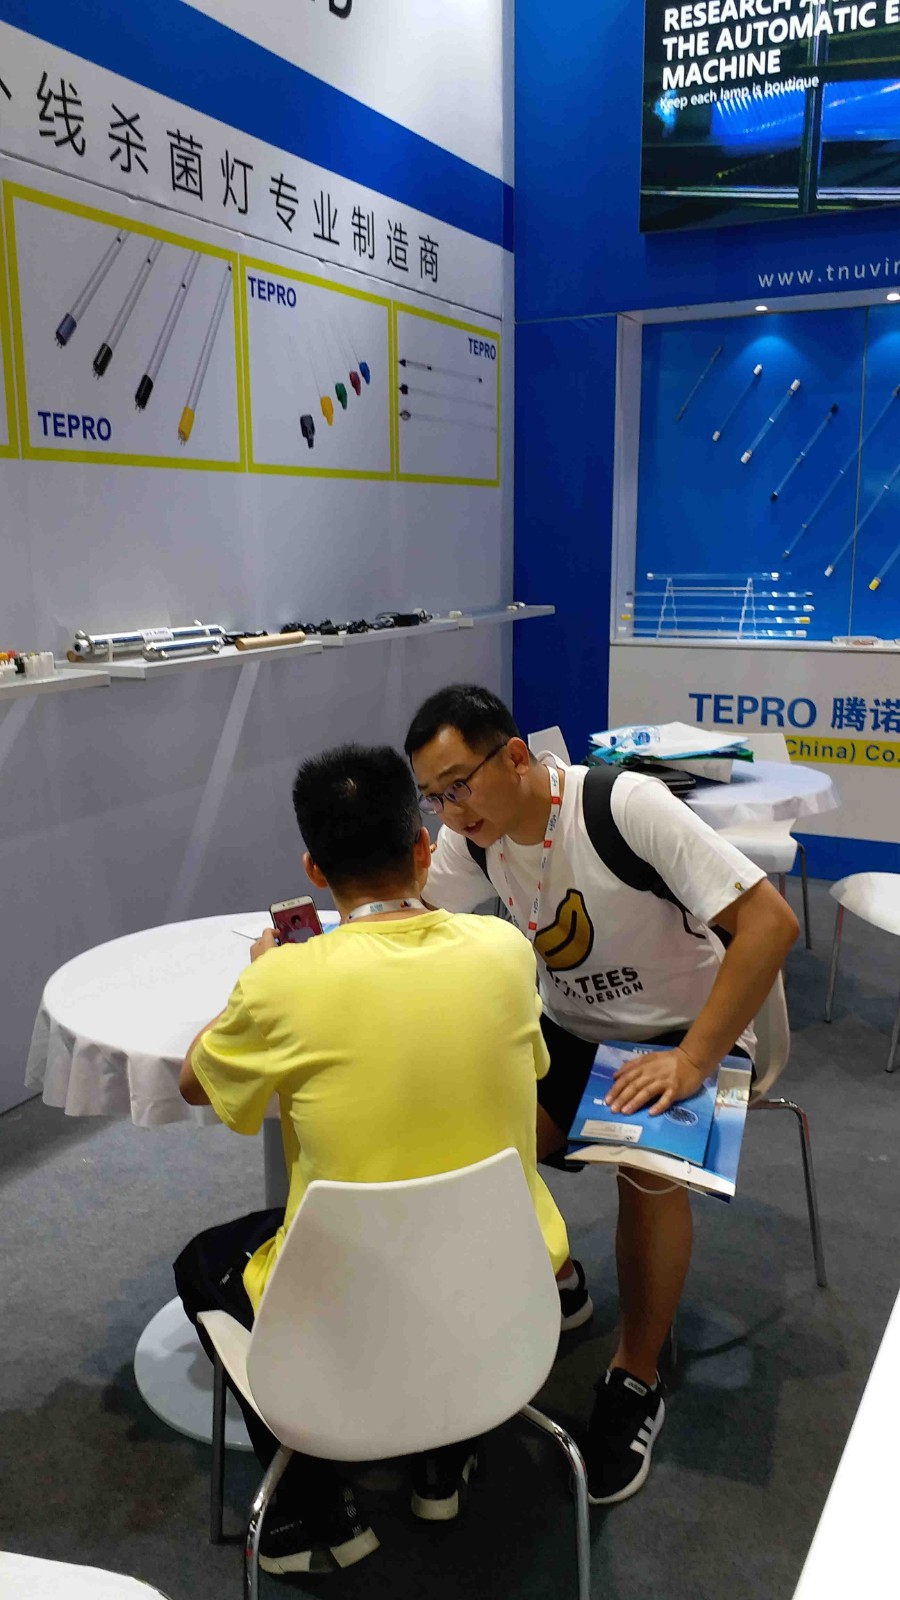 Tepro-Aquatech China Environment 2019 In Shanghai, Tepro china Co, Ltd-4